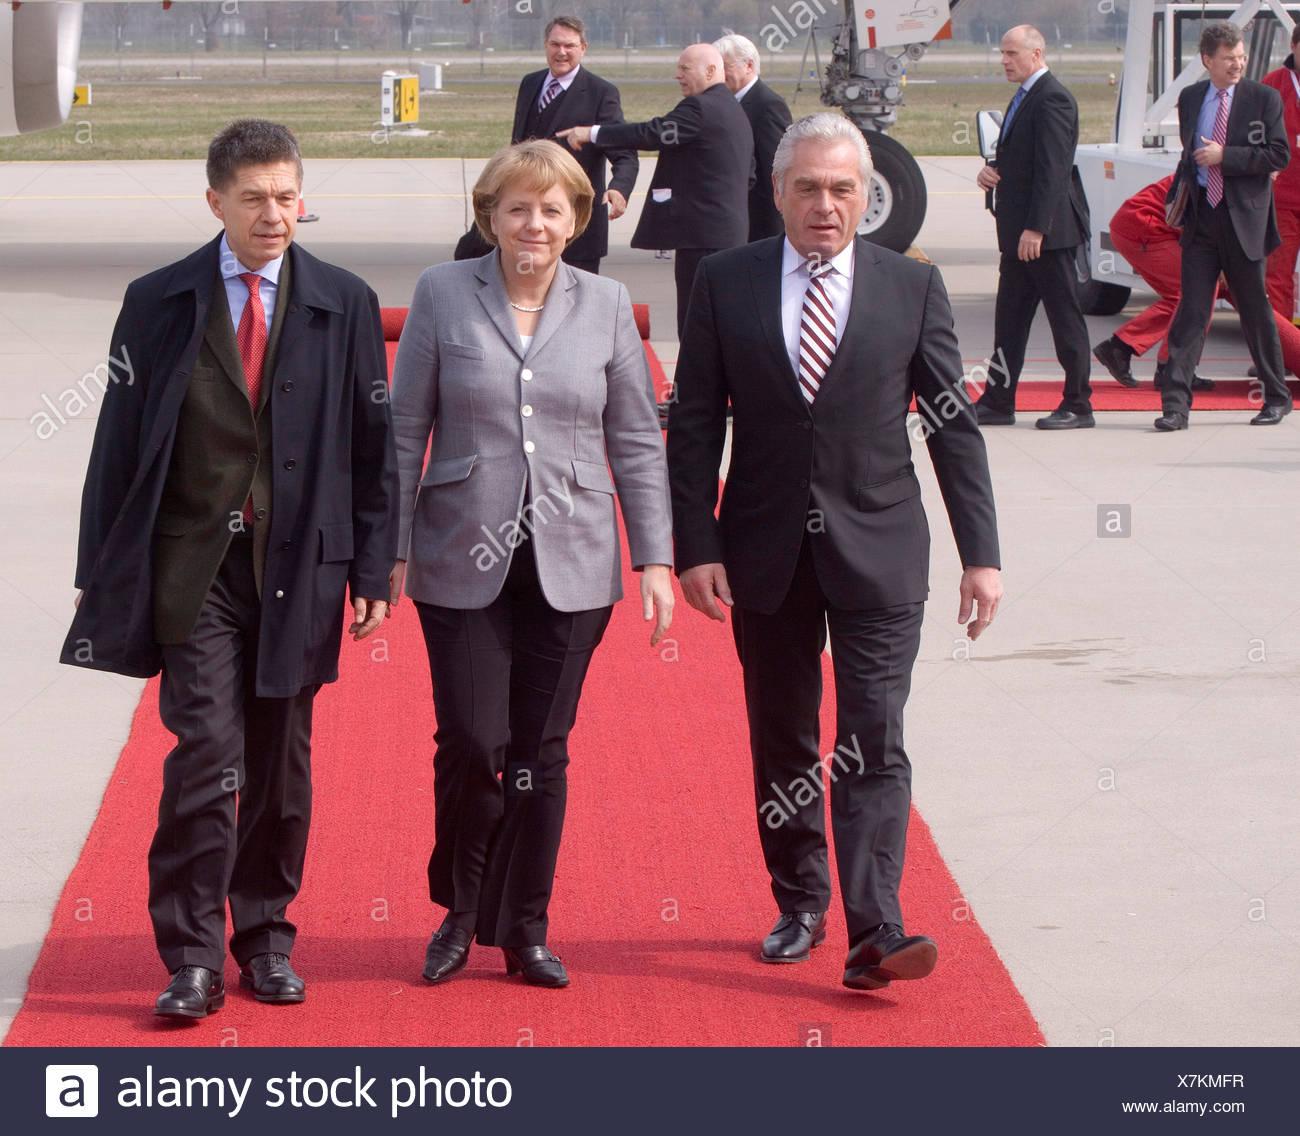 Heribert Rech, interior minister of Baden-Wuerttemberg, Federal Chancellor Dr. Angela Merkel and Prof. Joachim Sauer, 60 years  Stock Photo